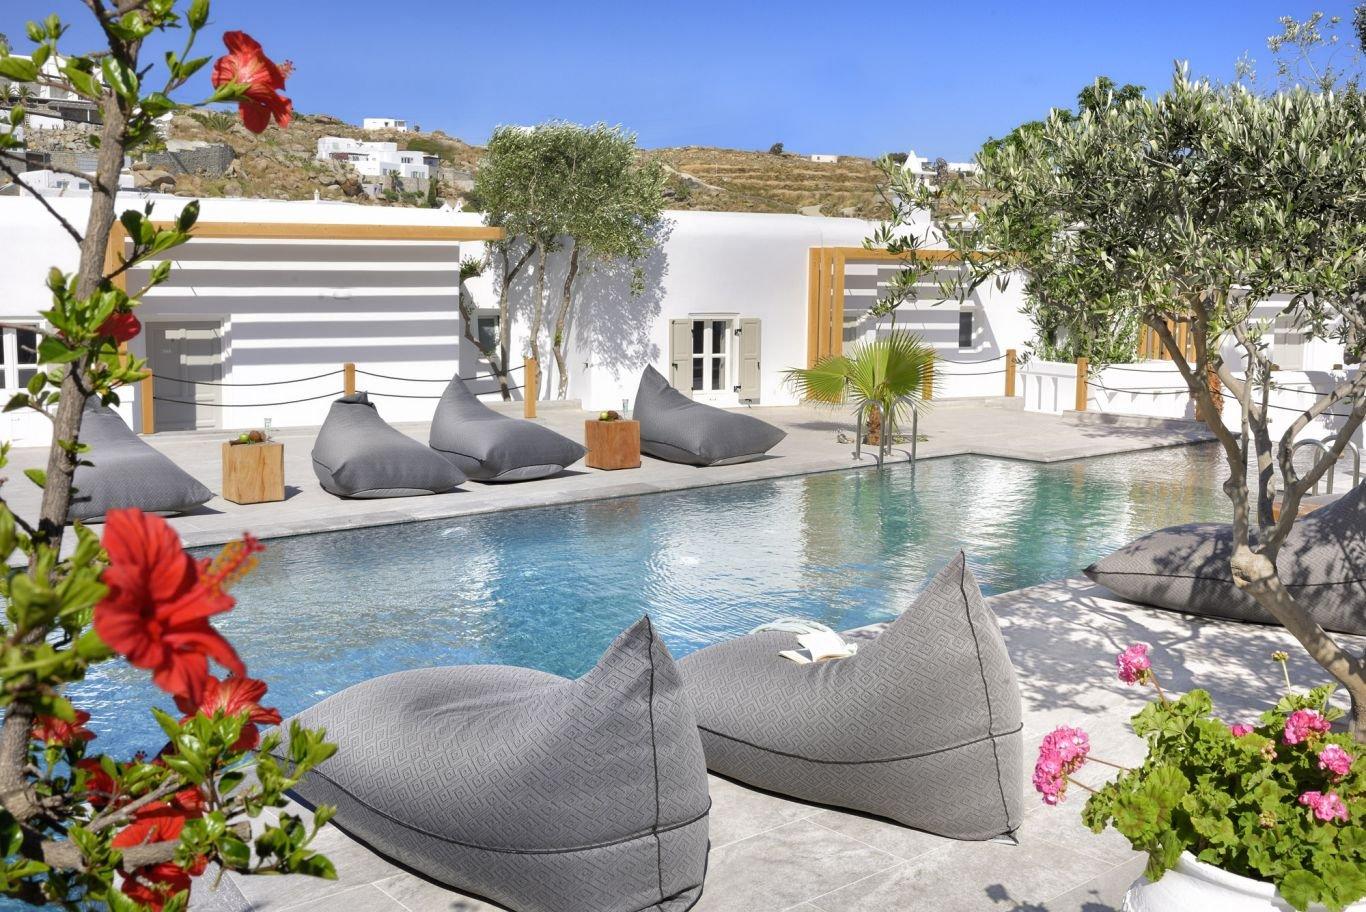 Petinos hotel - zwembad